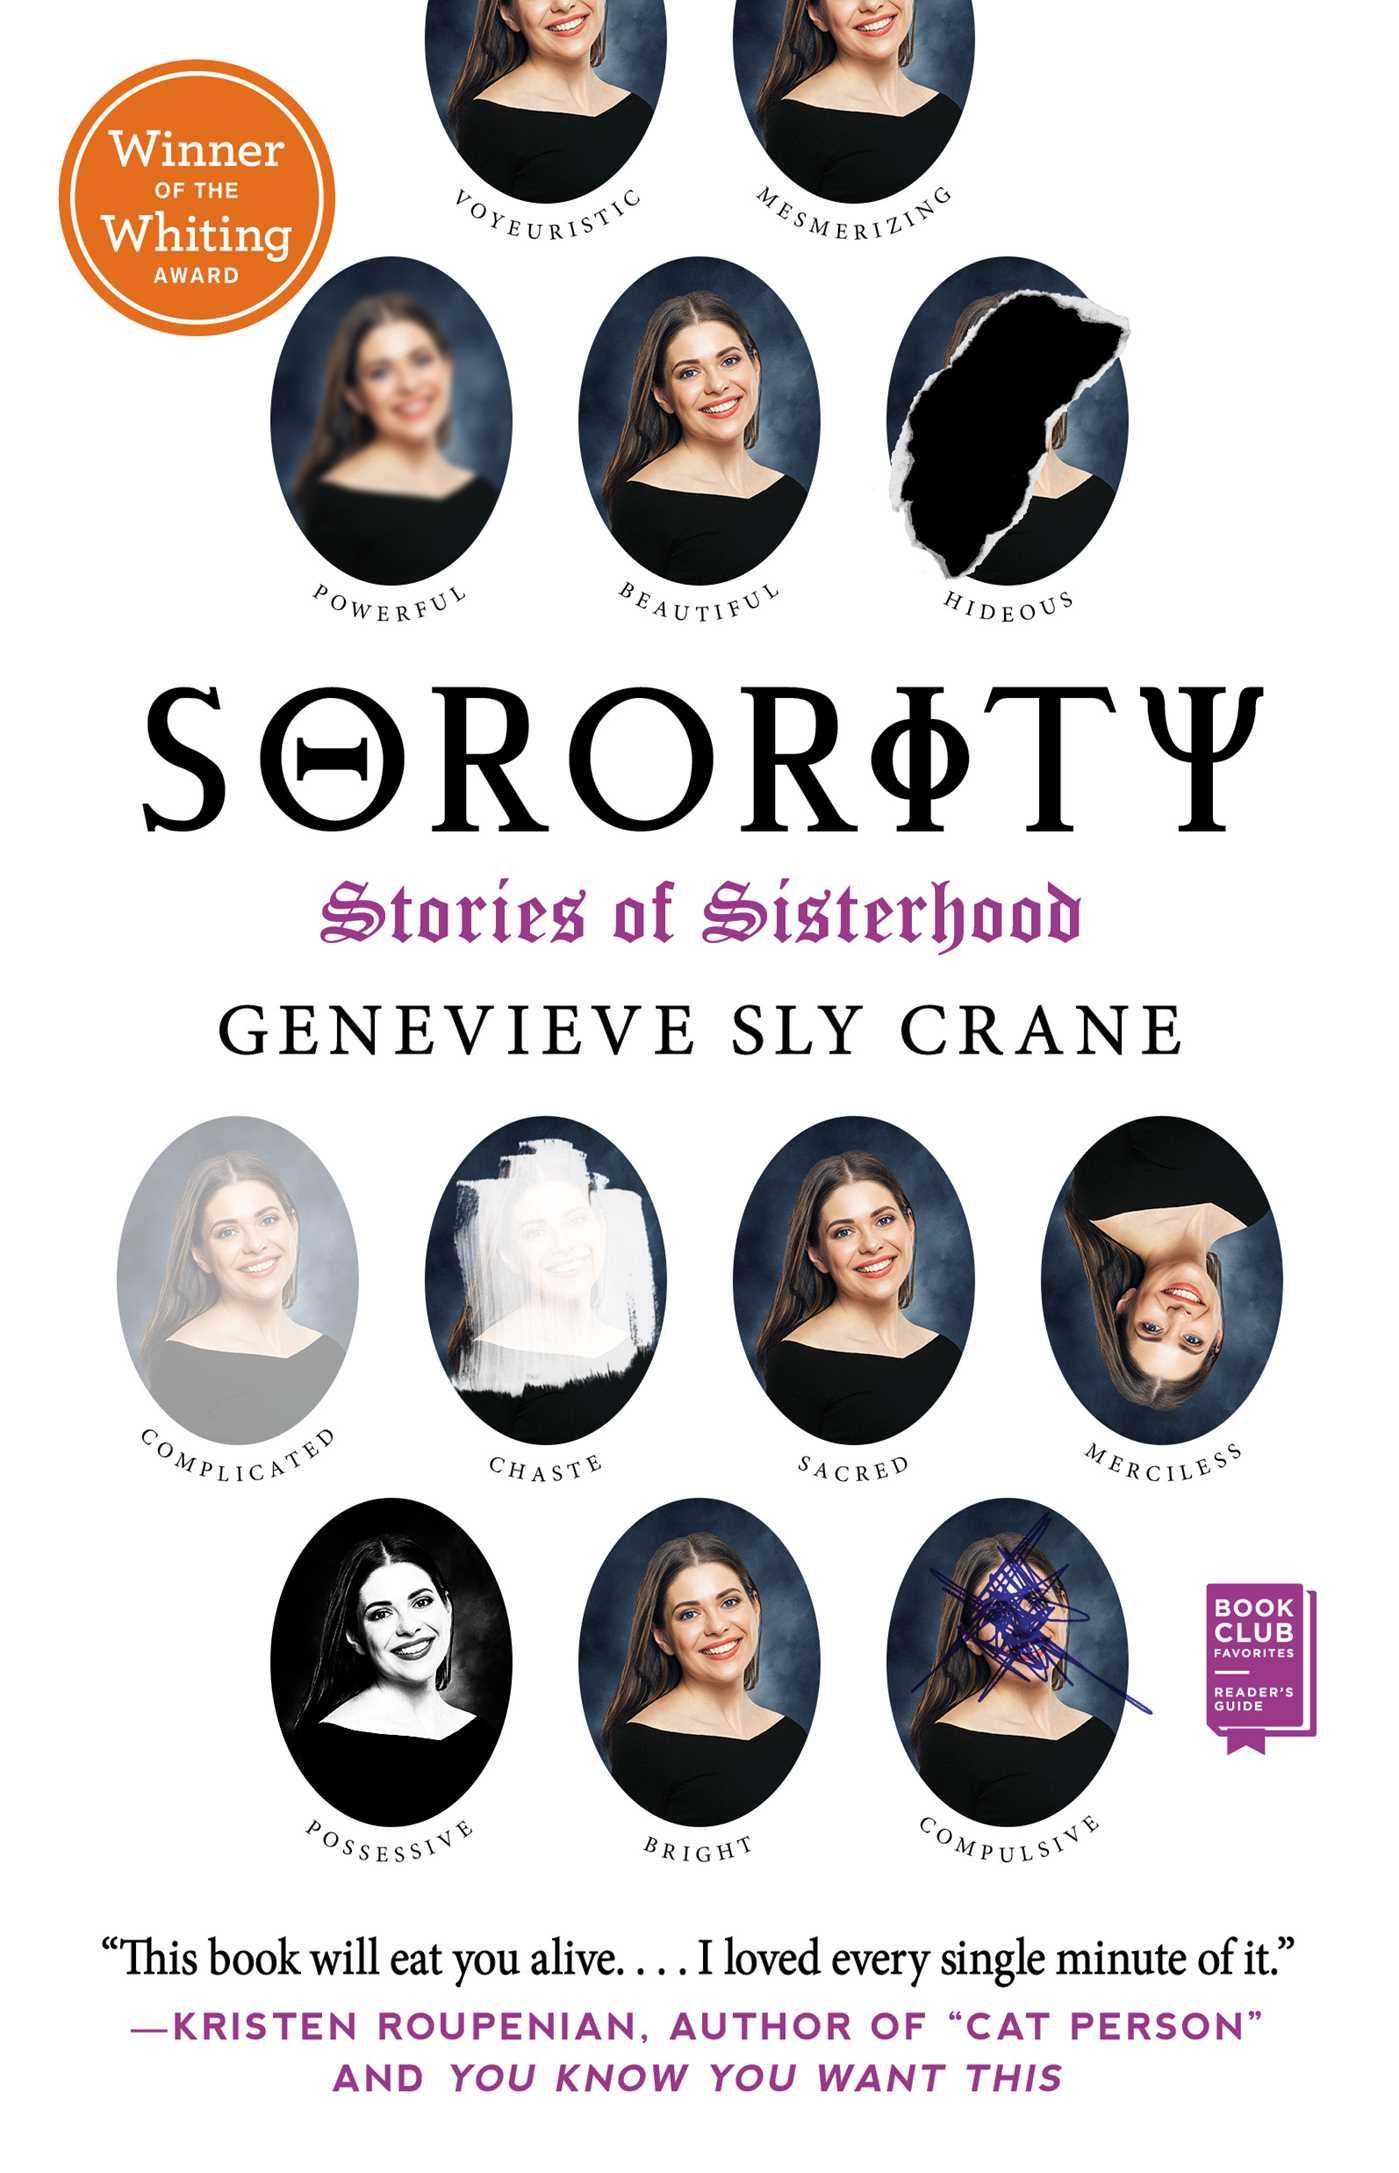 Sorority 9781501187490 hr